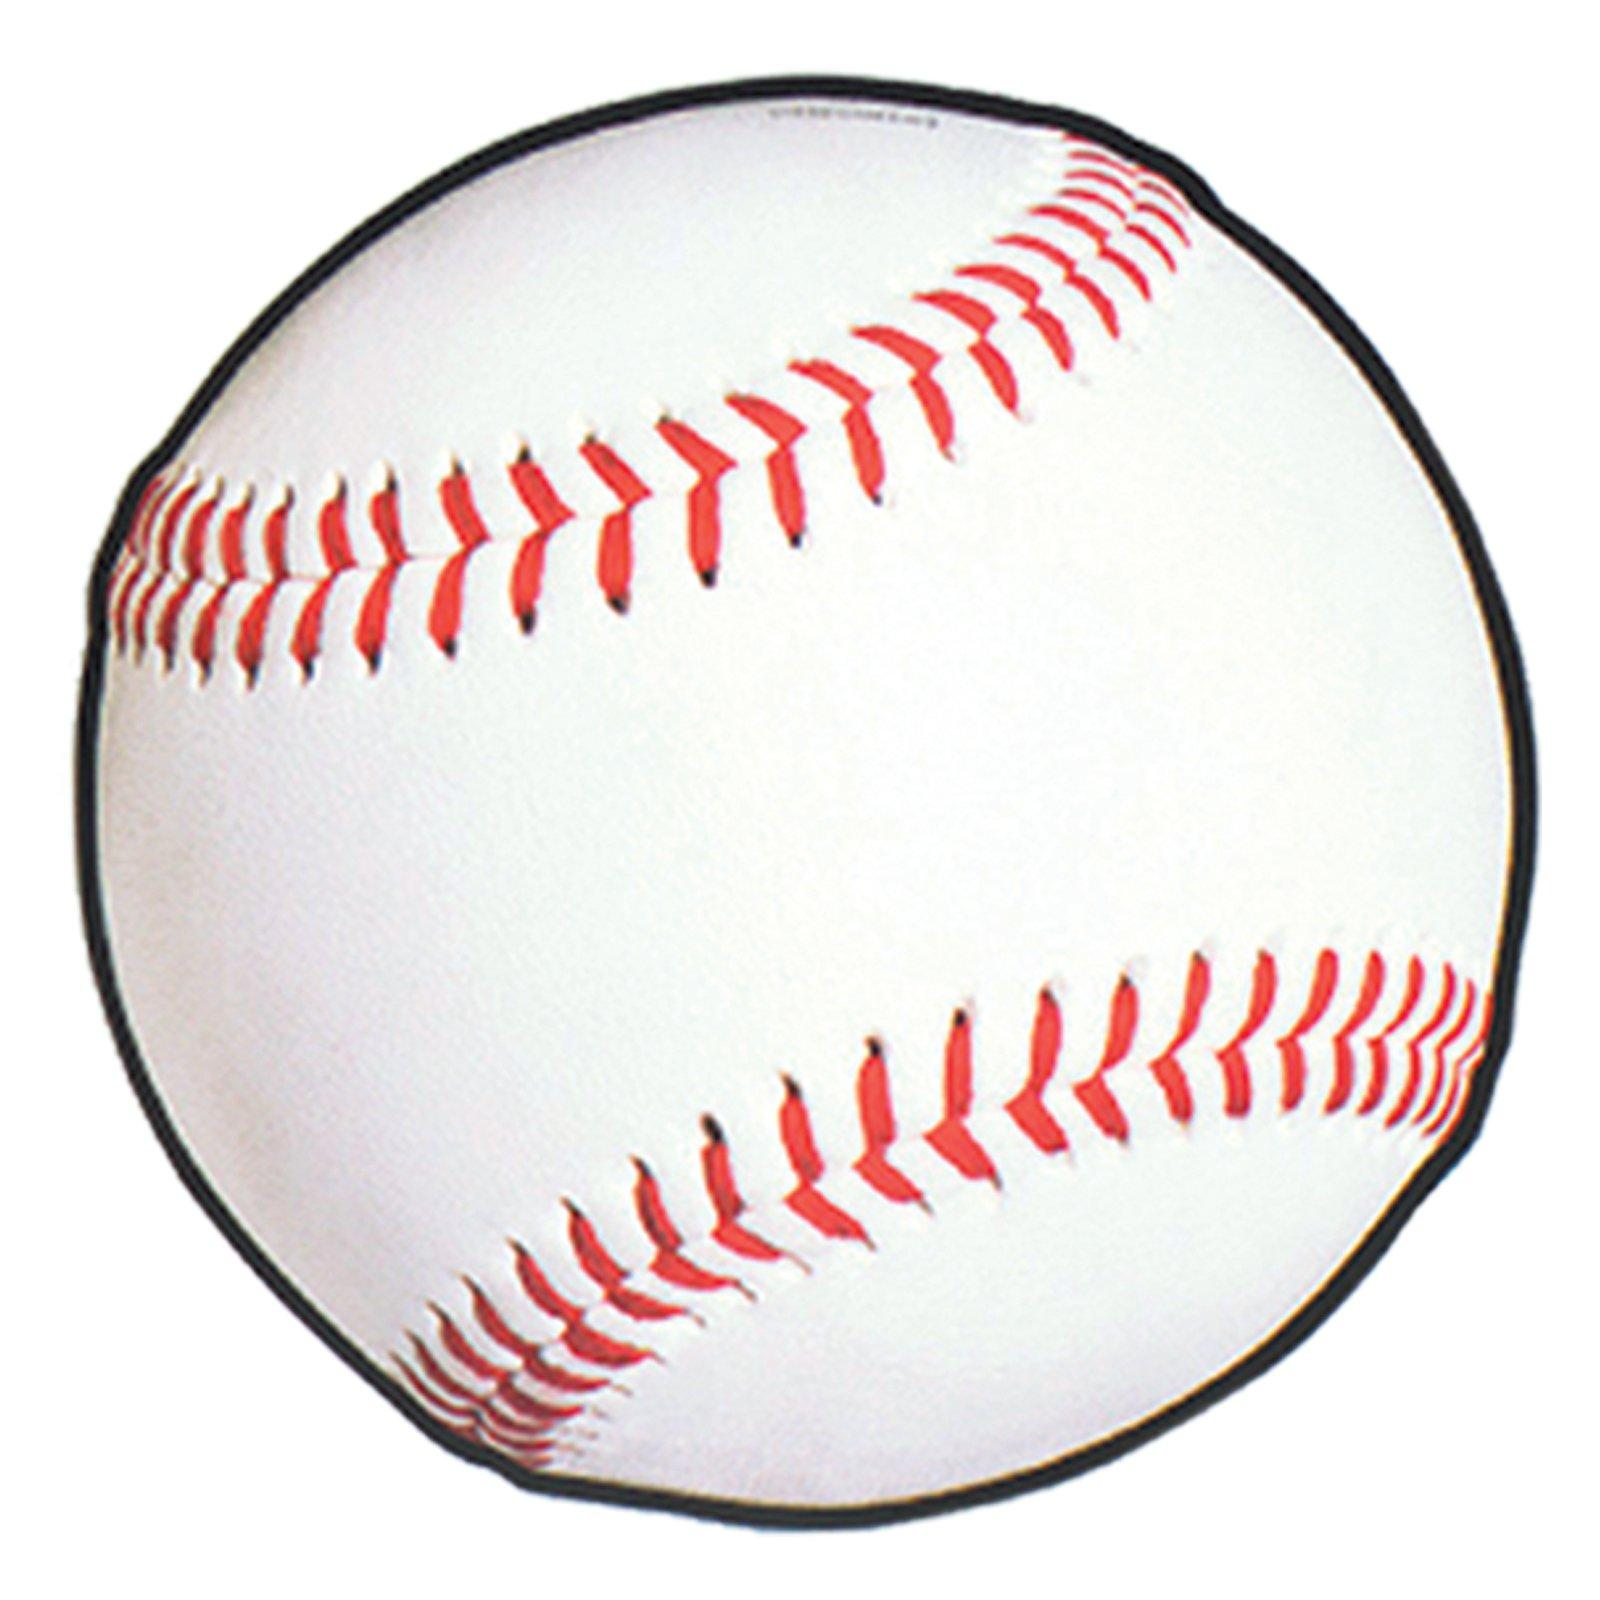 graphic regarding Baseball Printable named No cost Printable Baseball Clip Artwork no cost graphic